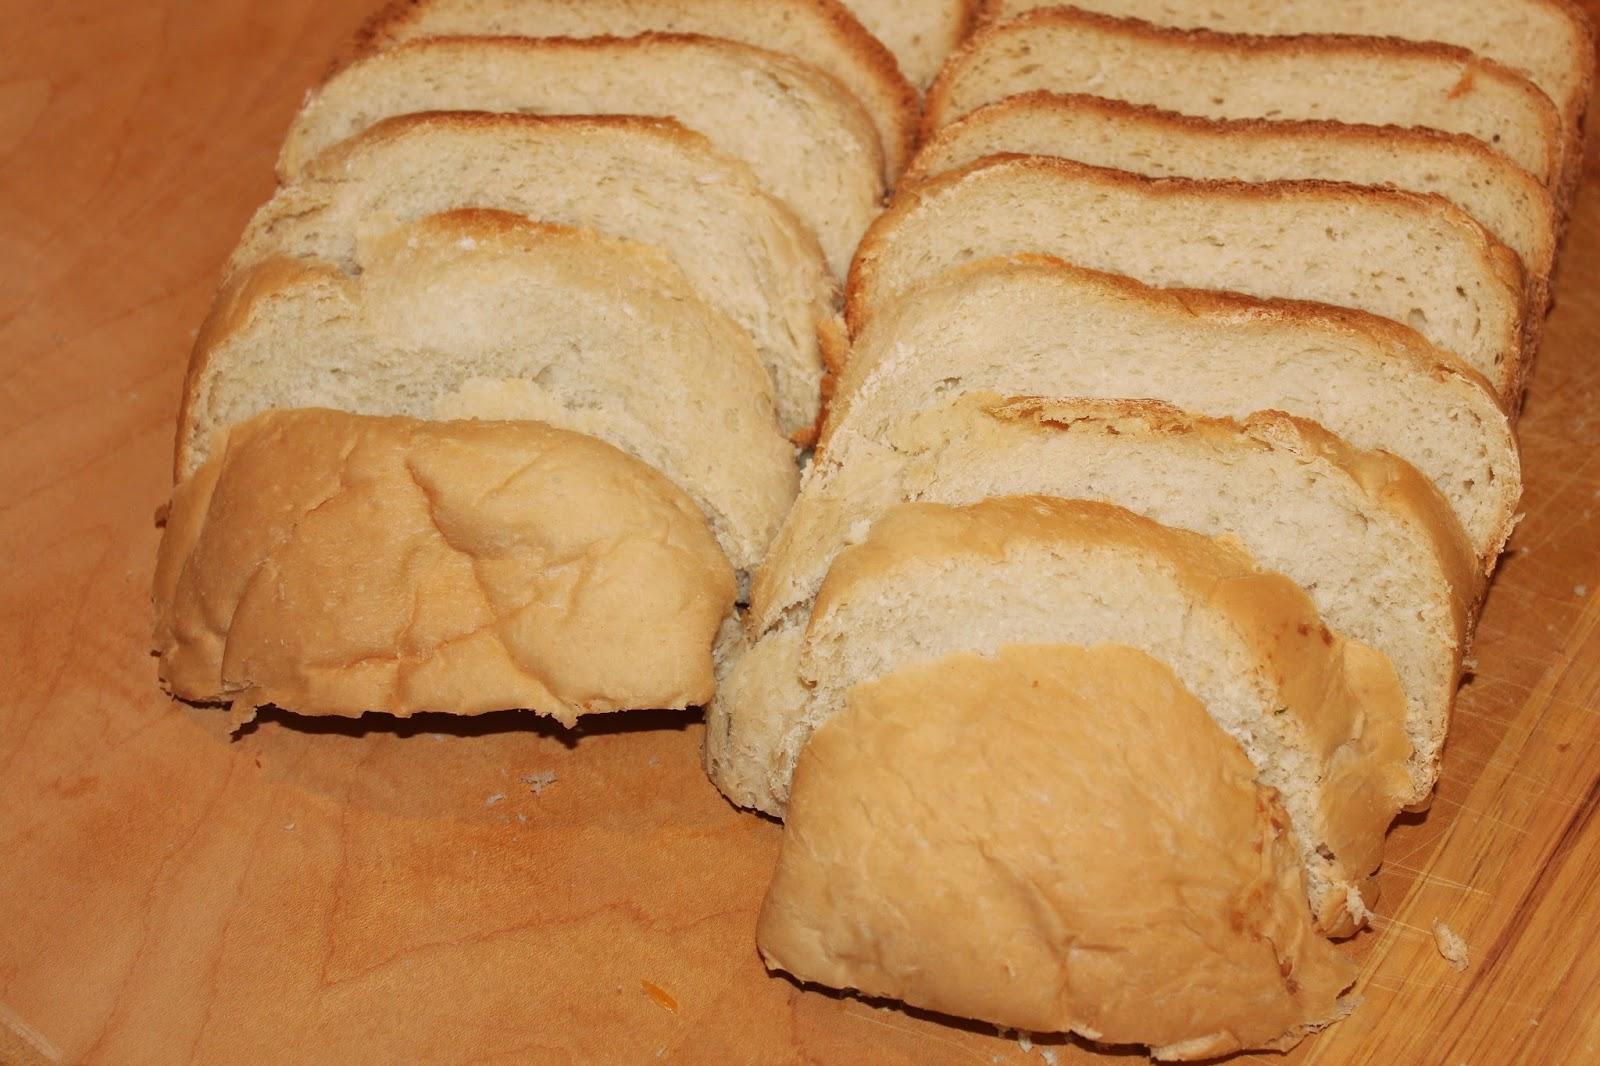 IMG 4643 - Homemade Bread